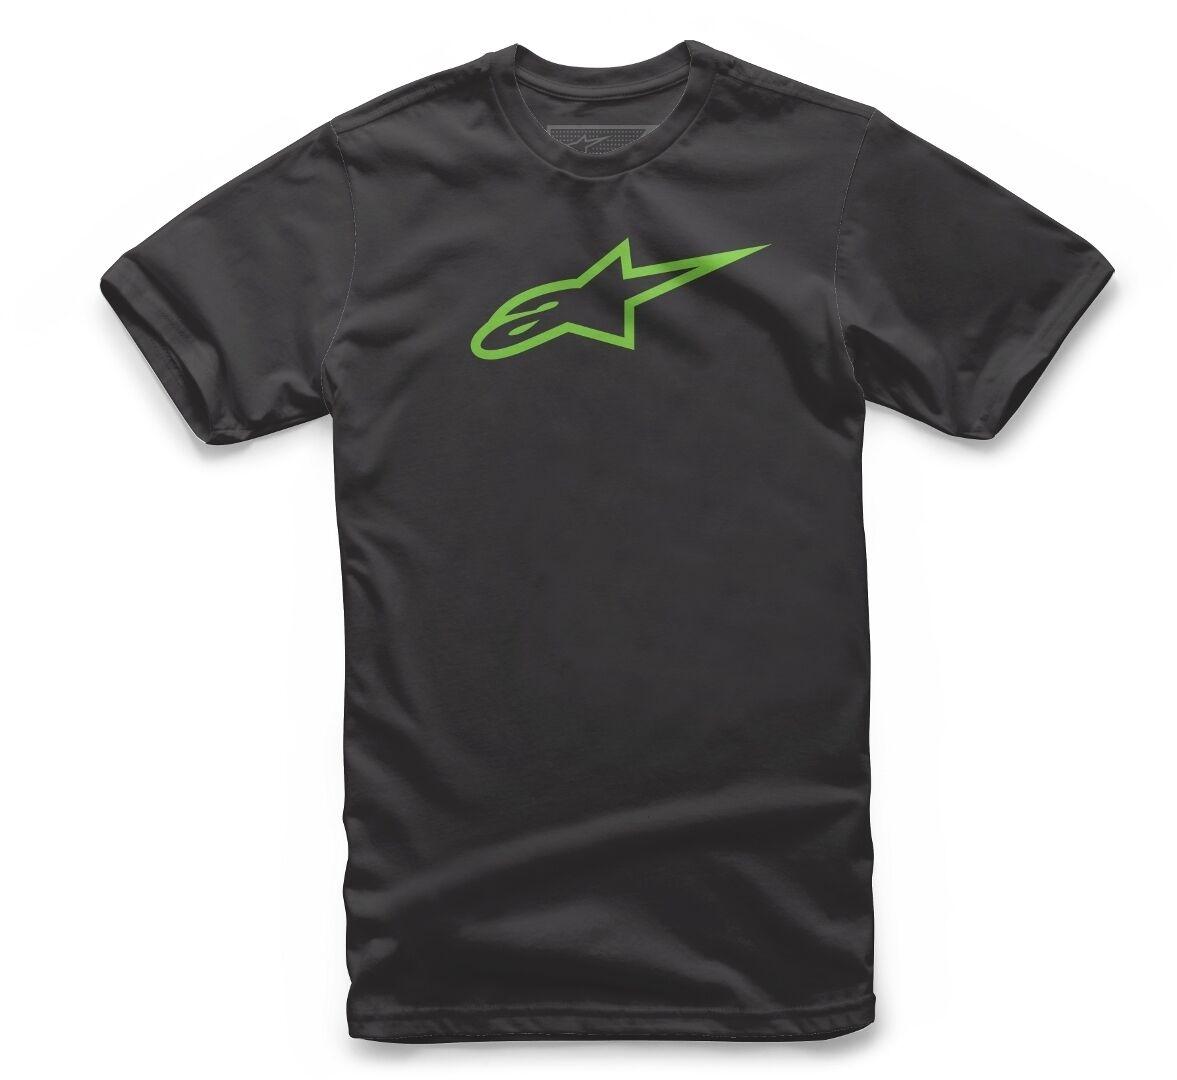 Alpinestars Ageless Tee Kids T-Shirt unisex Black White Size: M